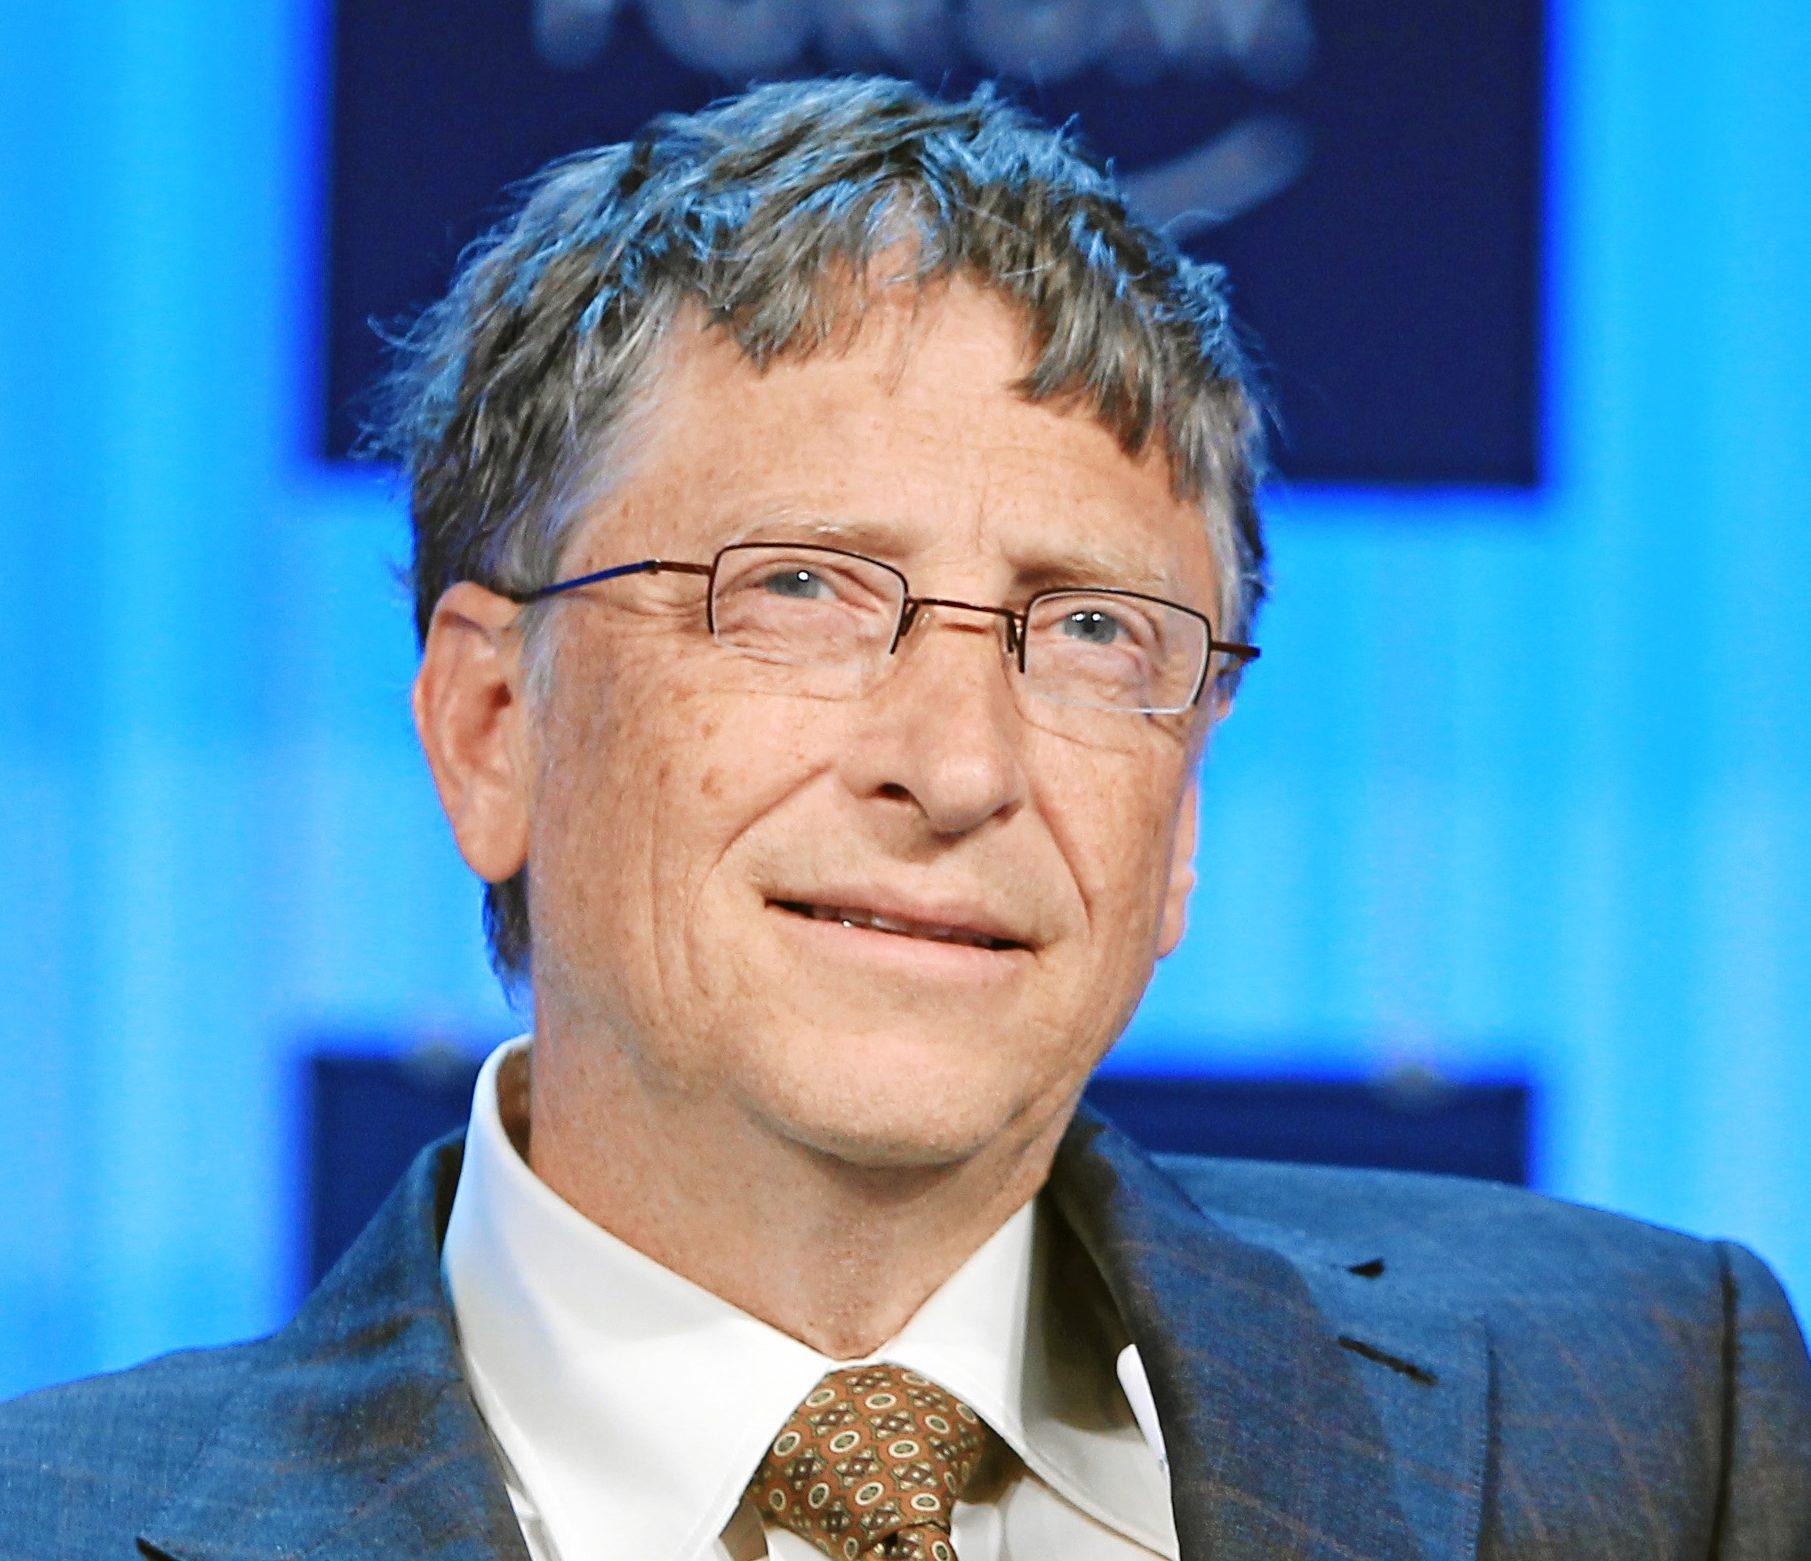 co czyta Bill Gates